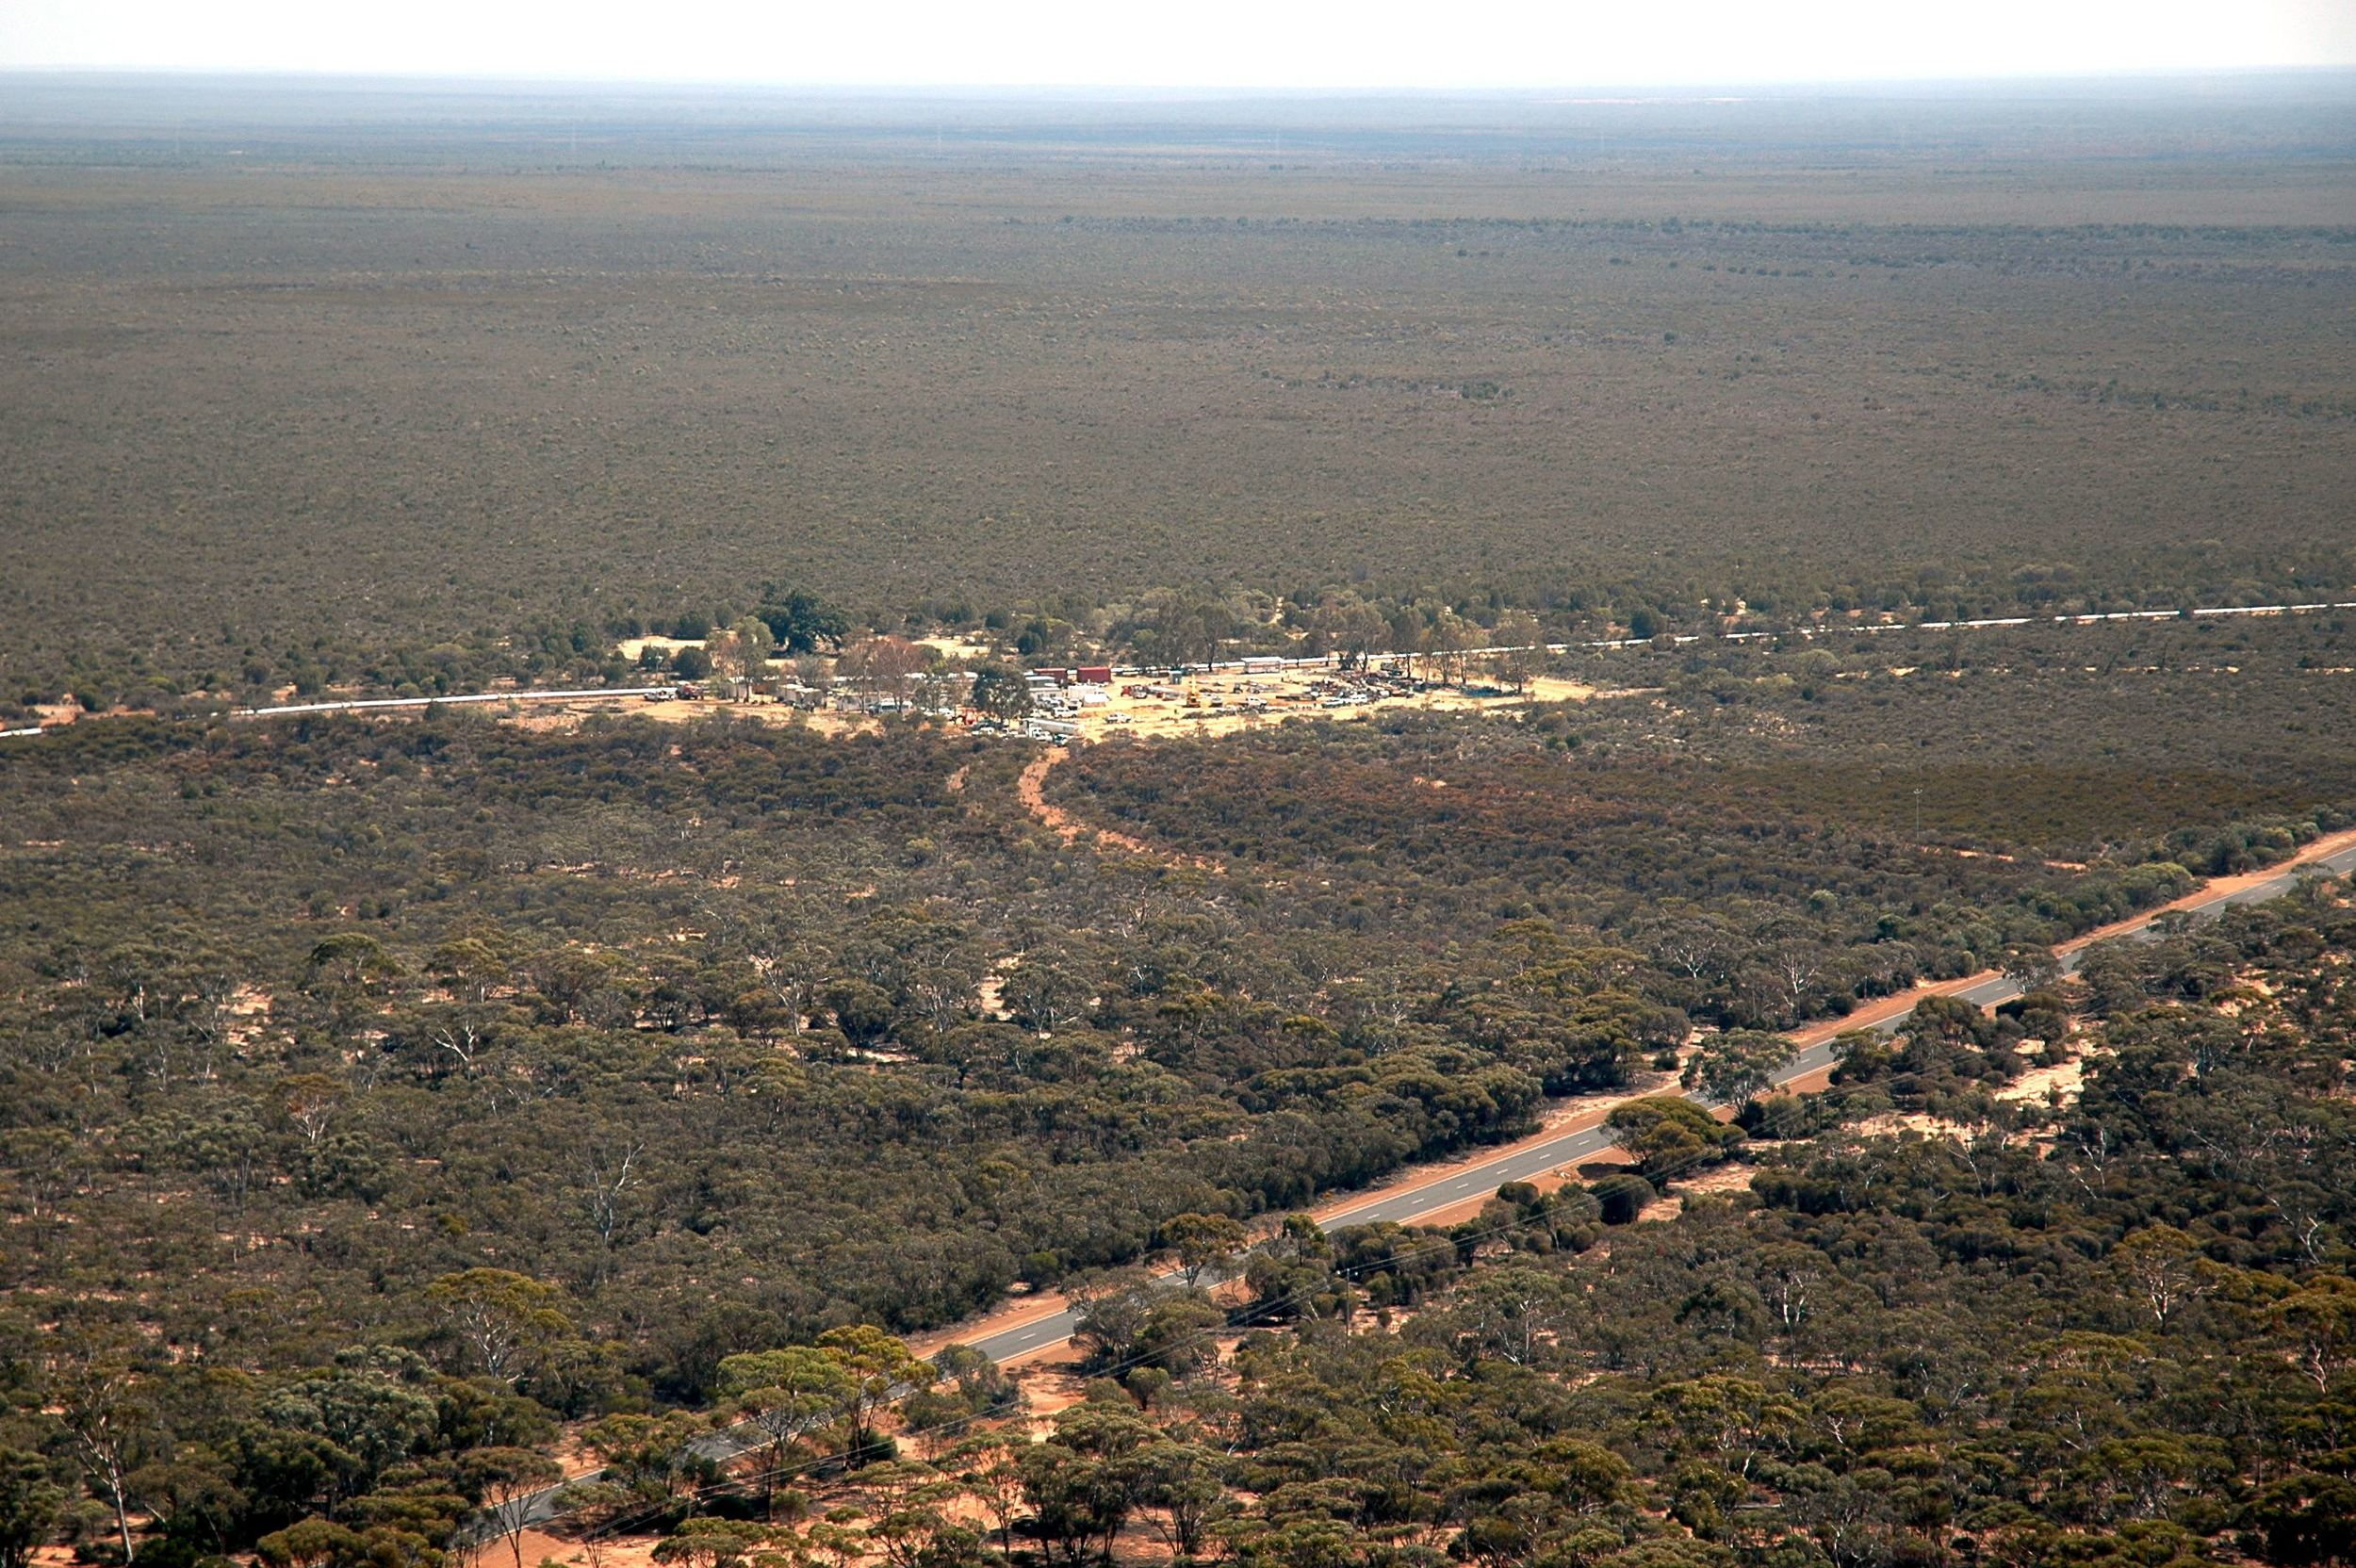 Koora Retreat is positionedin the centre of the Great Western Woodlands of Western Australia